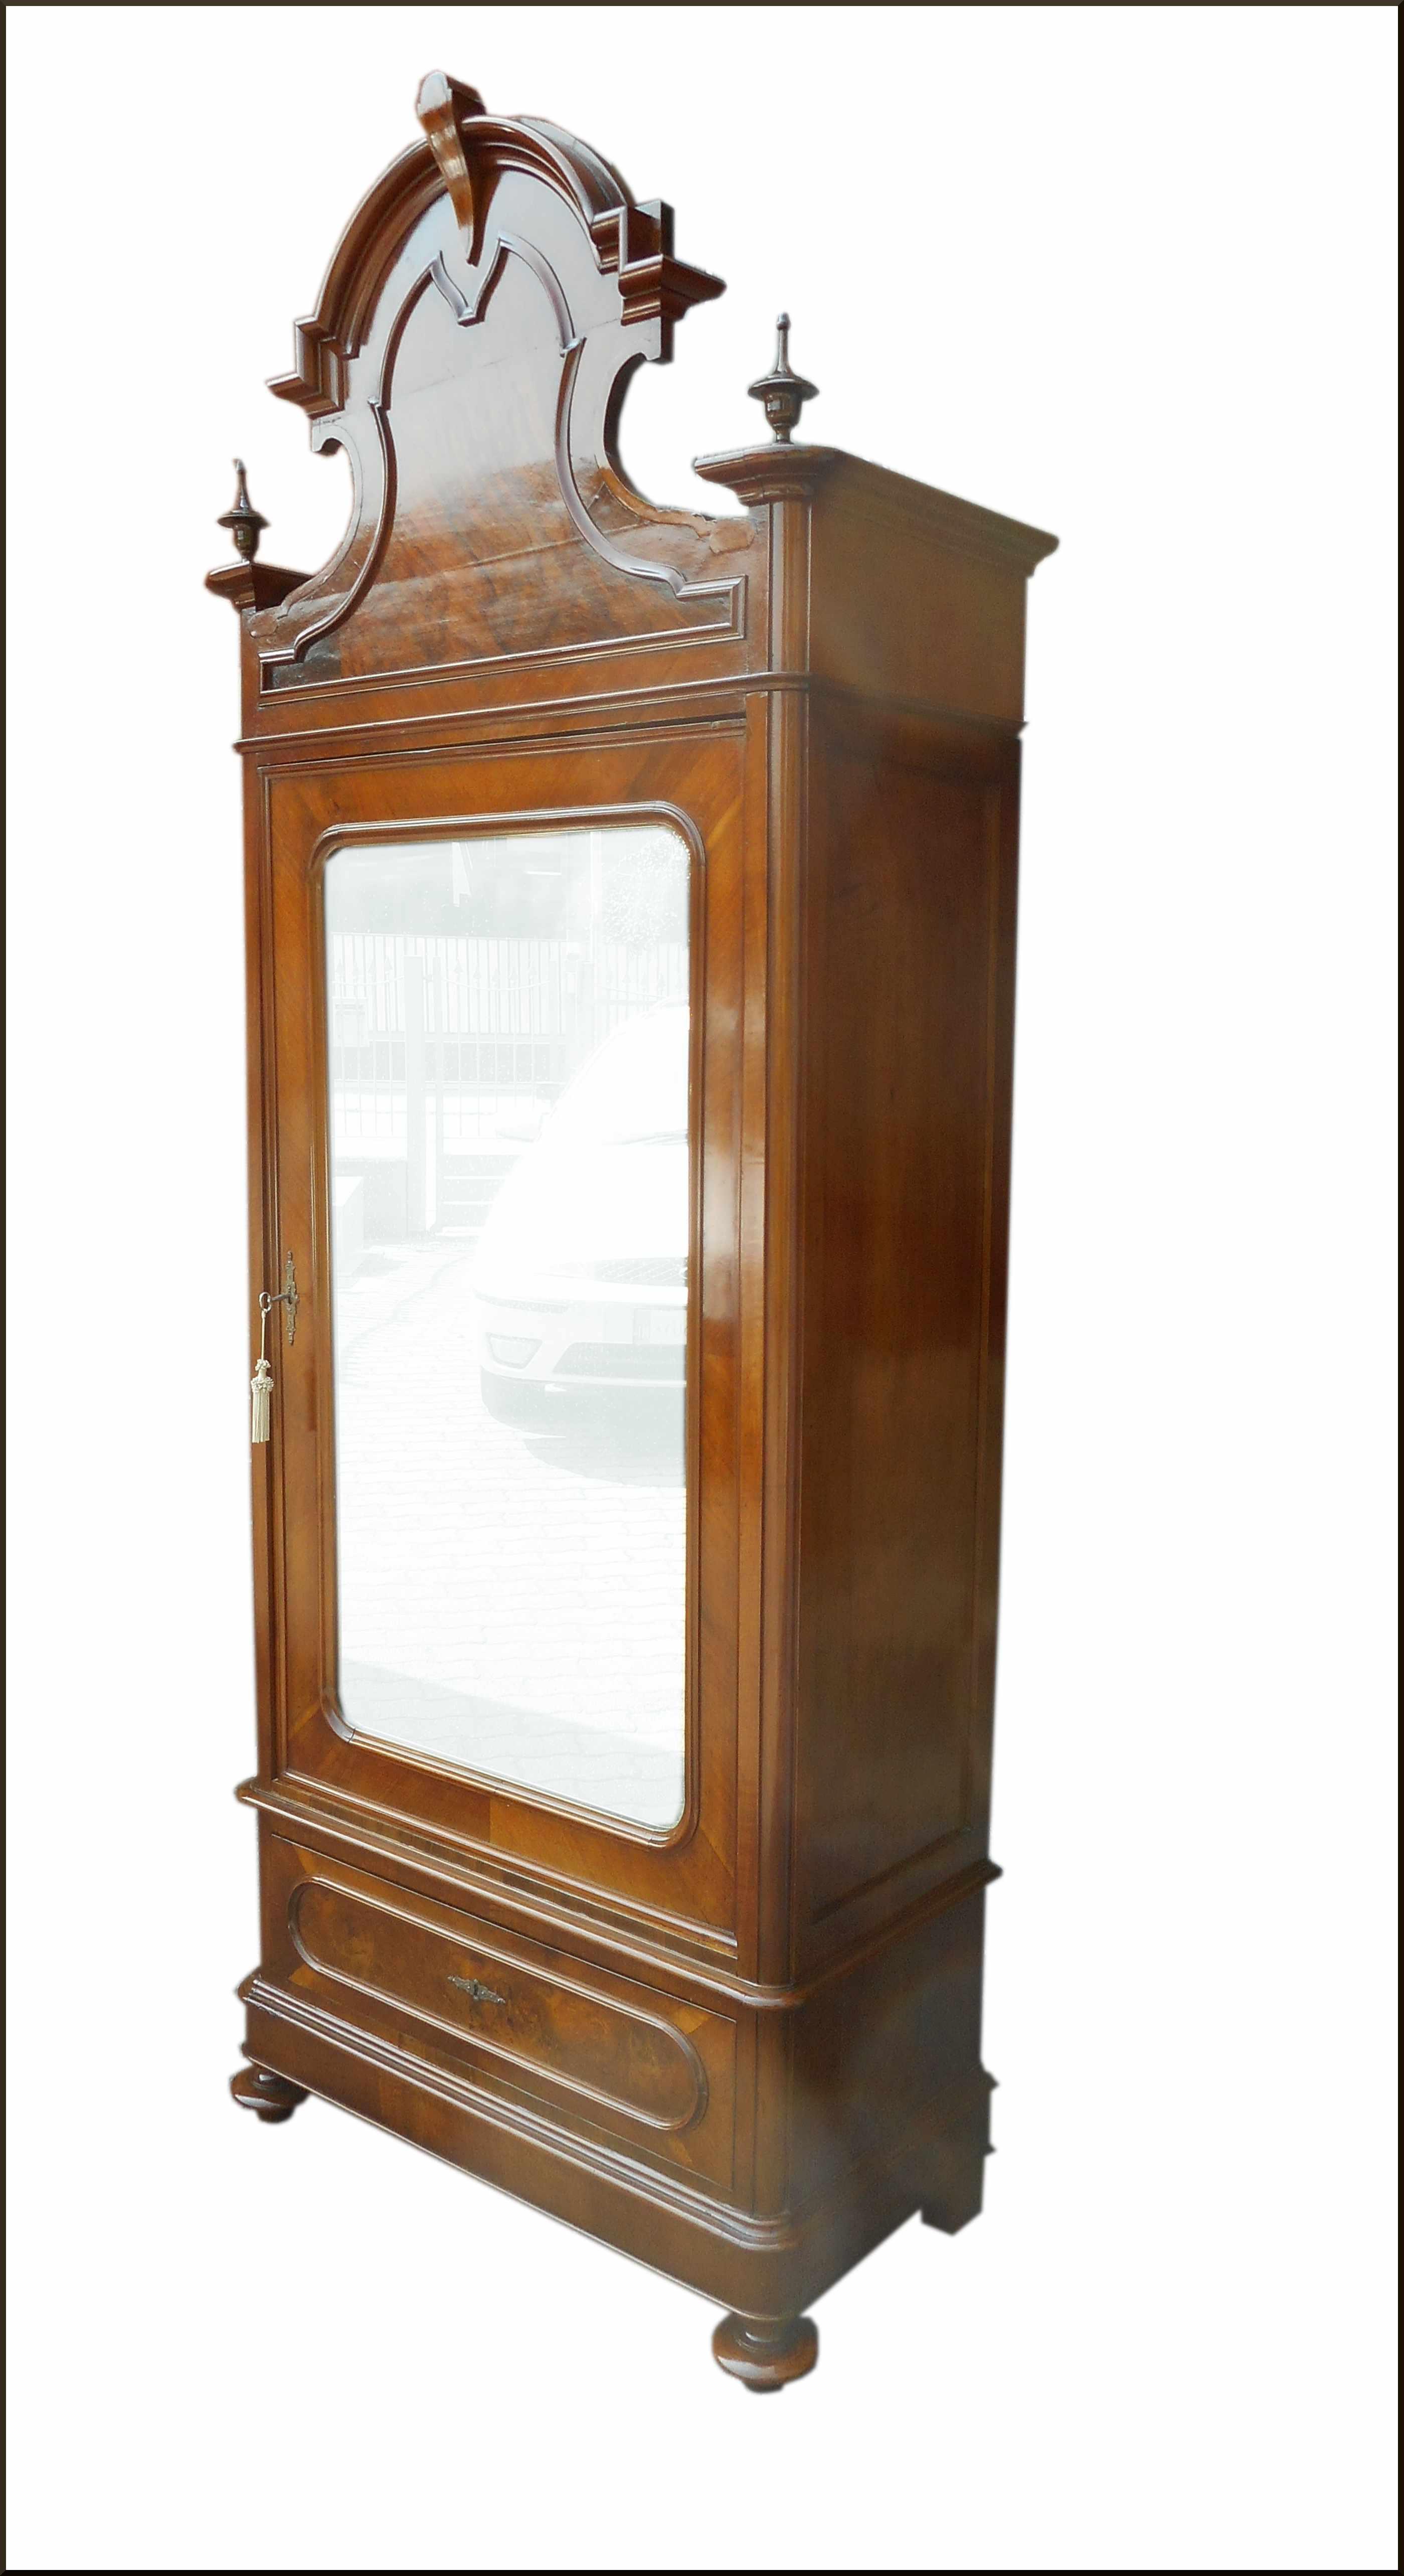 Antico armadio 800 lombardo